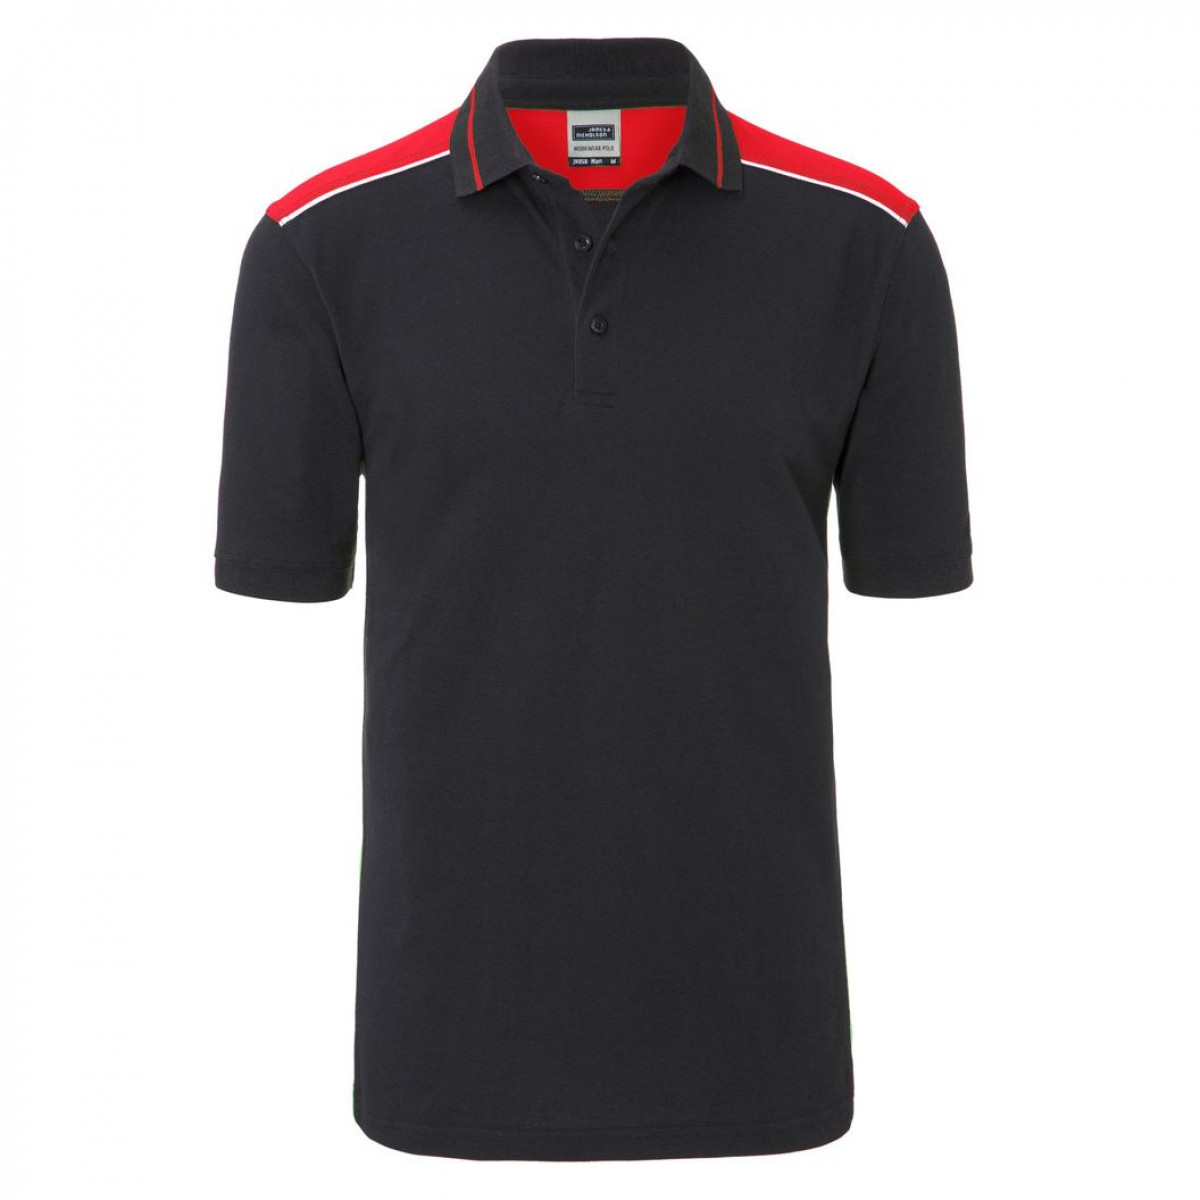 Рубашка поло мужская JN858 Mens Workwear Polo-Level 2 - Темно-серый/Красный